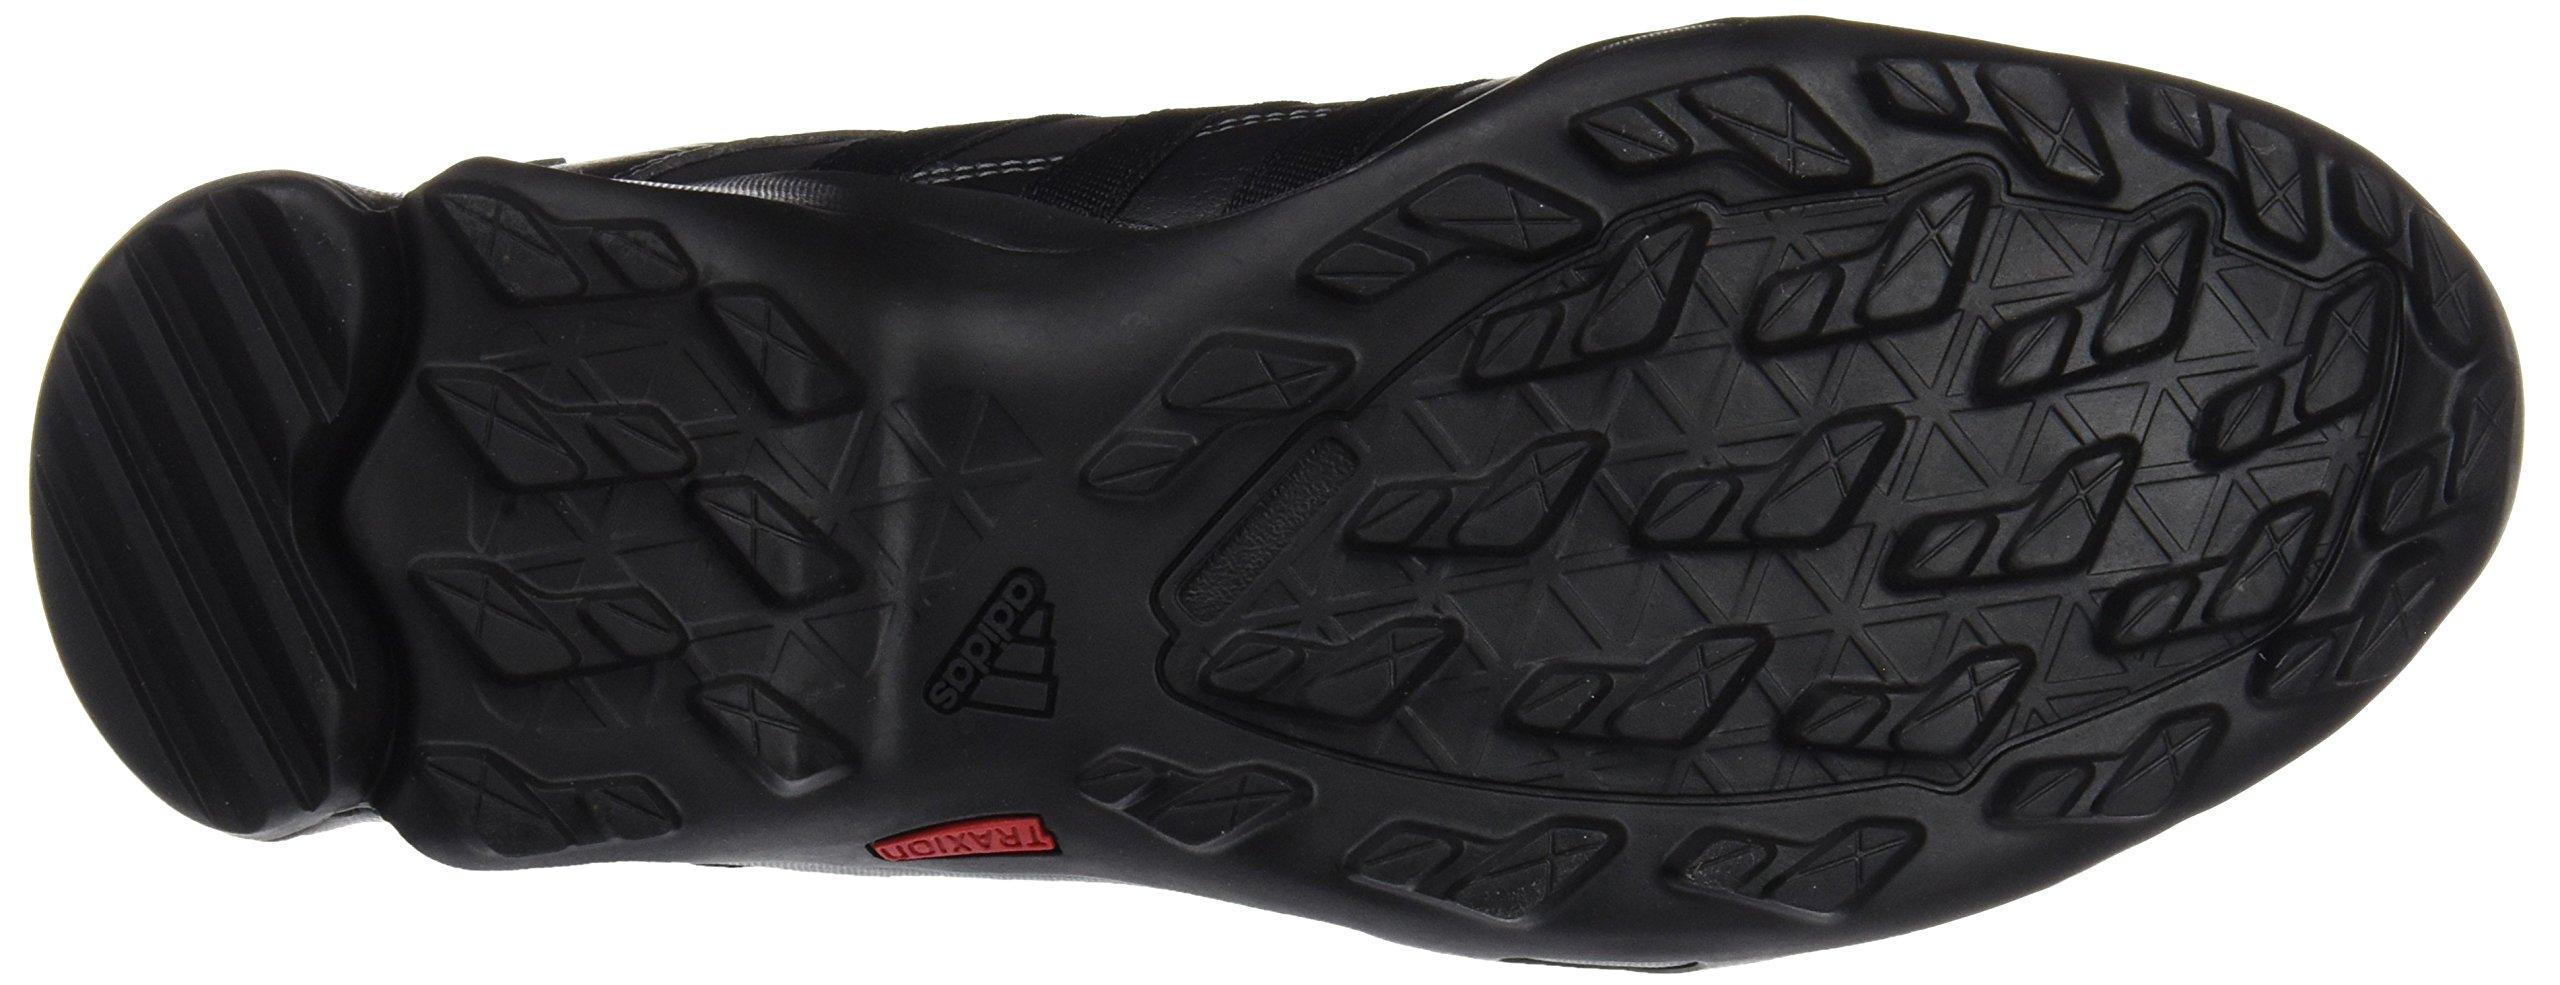 711btCRJhtL - adidas Men's Terrex Ax2r Beta Mid Cw High Rise Hiking Boots